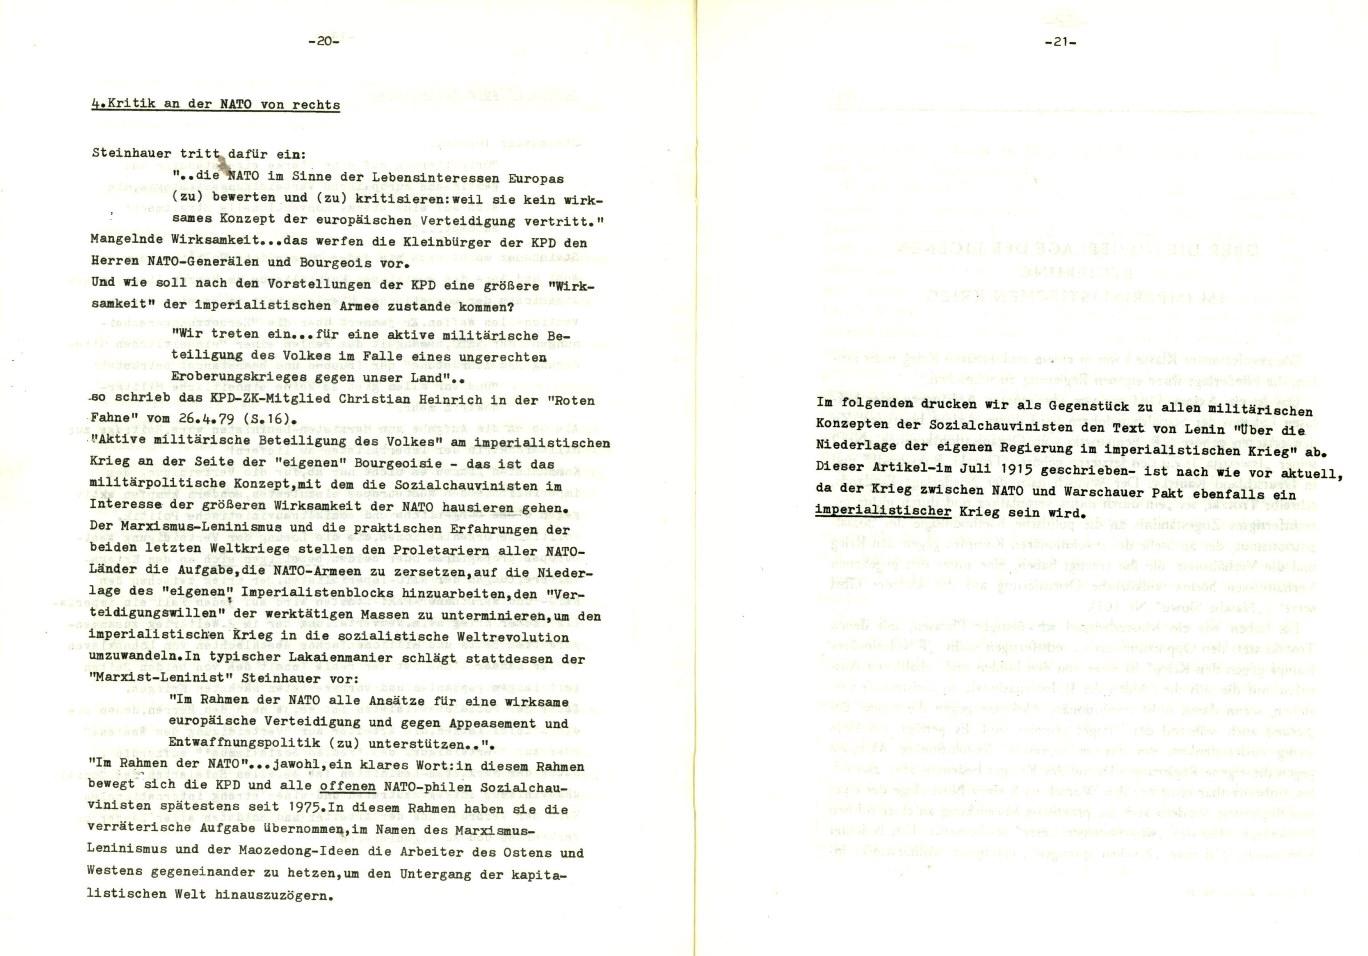 Muenchen_Kampf_dem_Revisionismus_1979_10_11